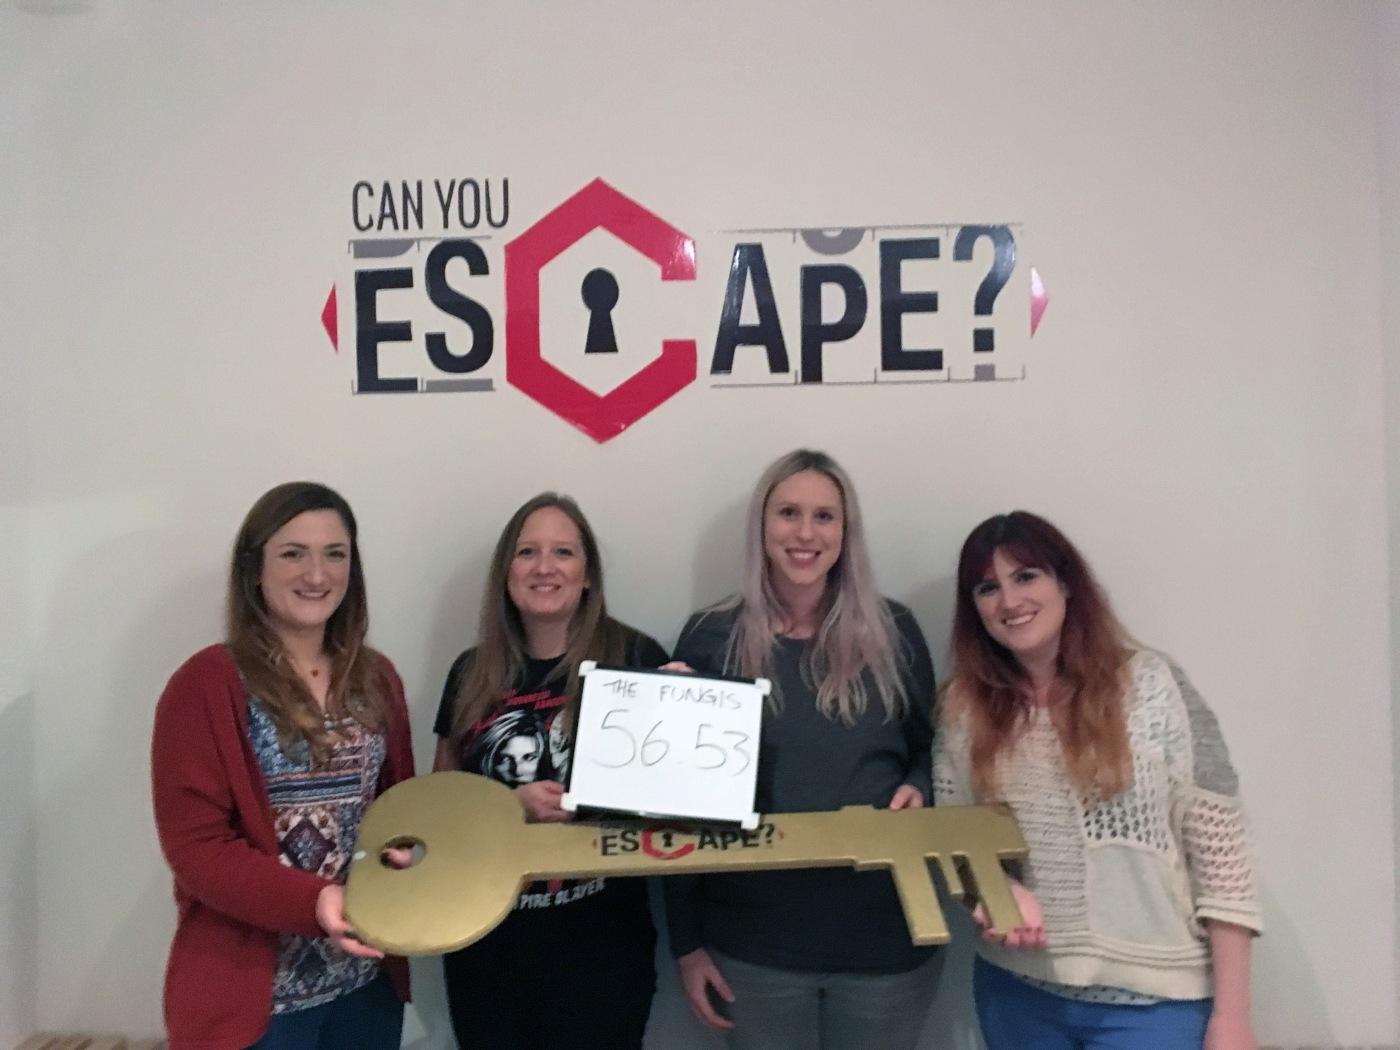 Can You Escape? York Escape Room